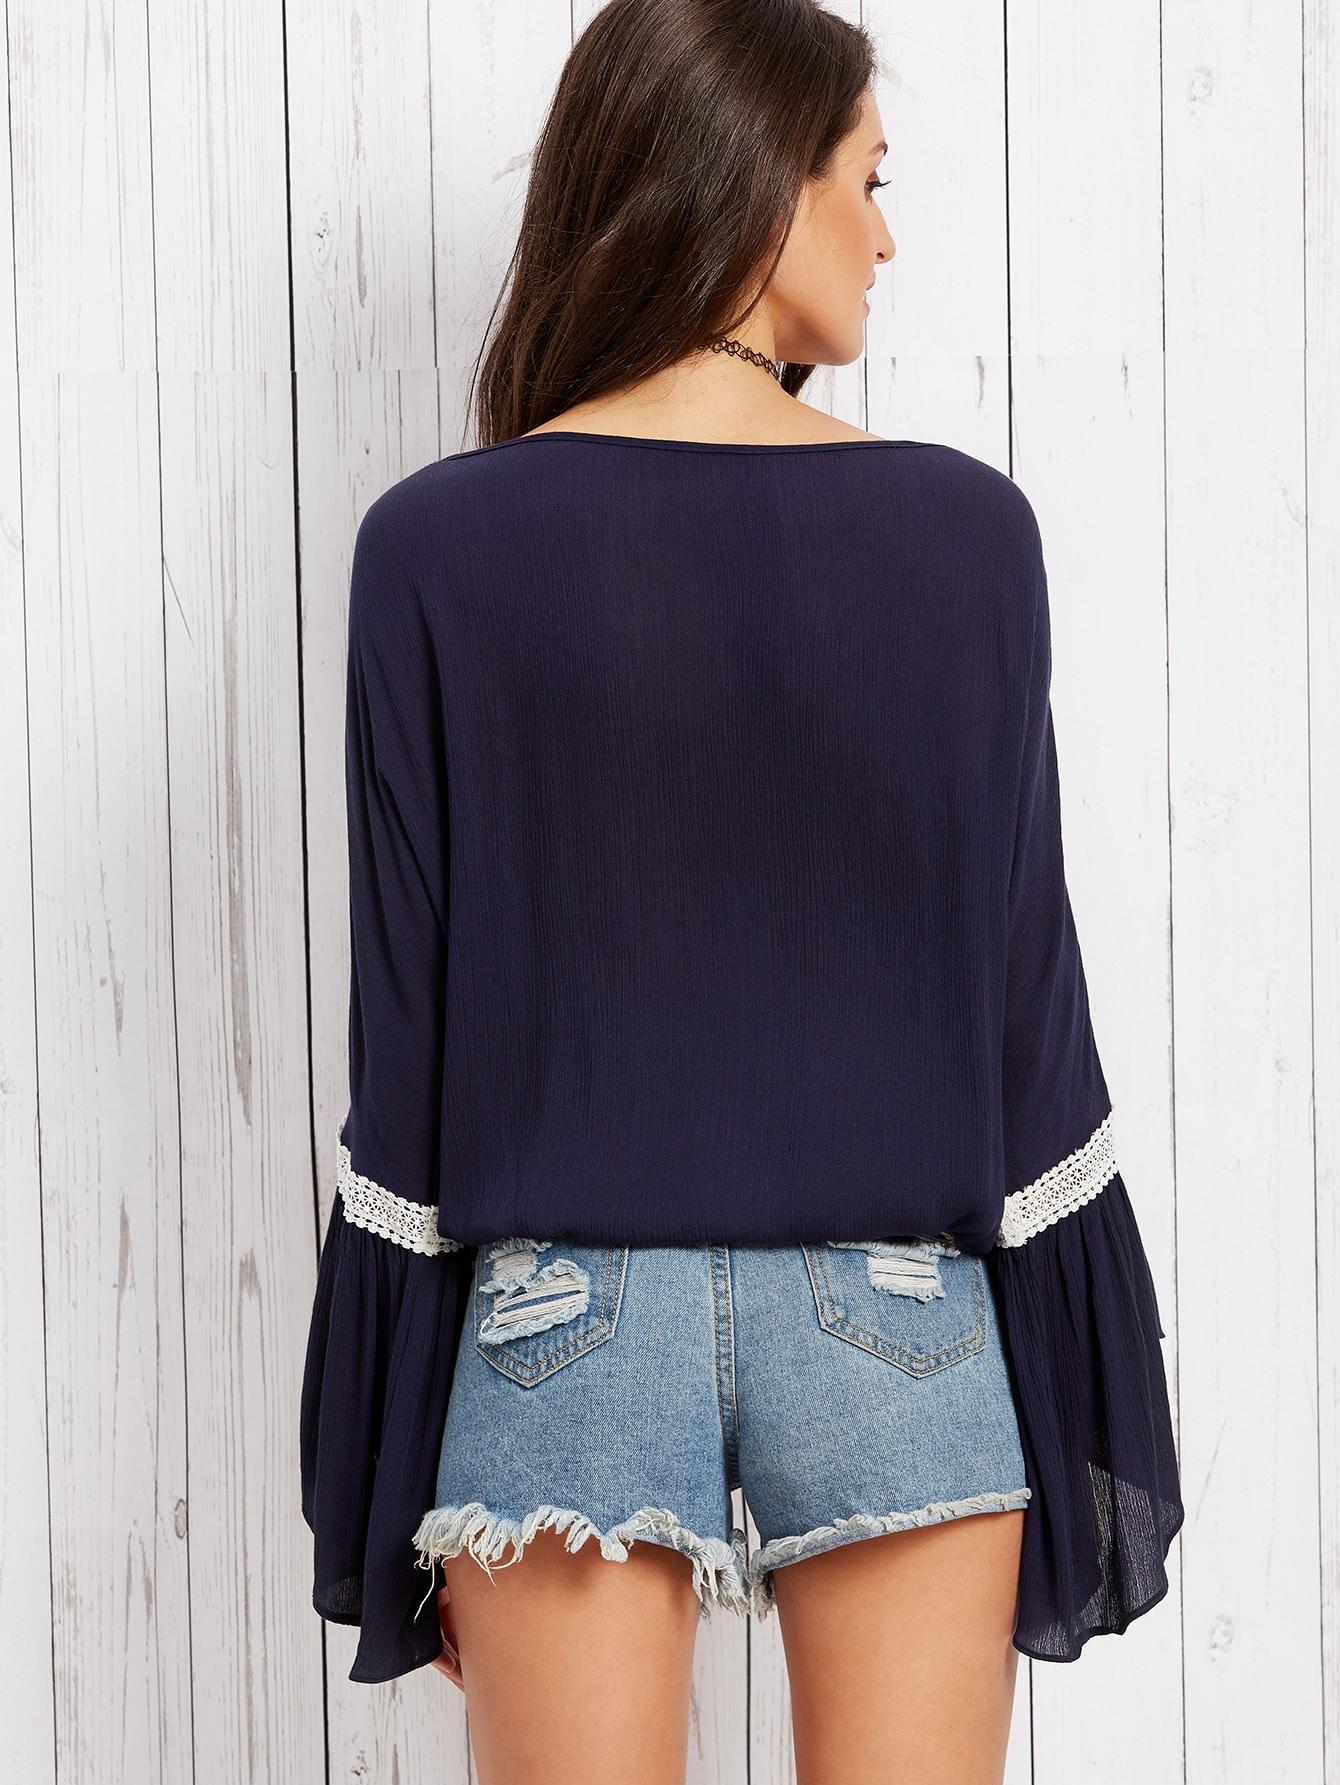 blouse160815025_2